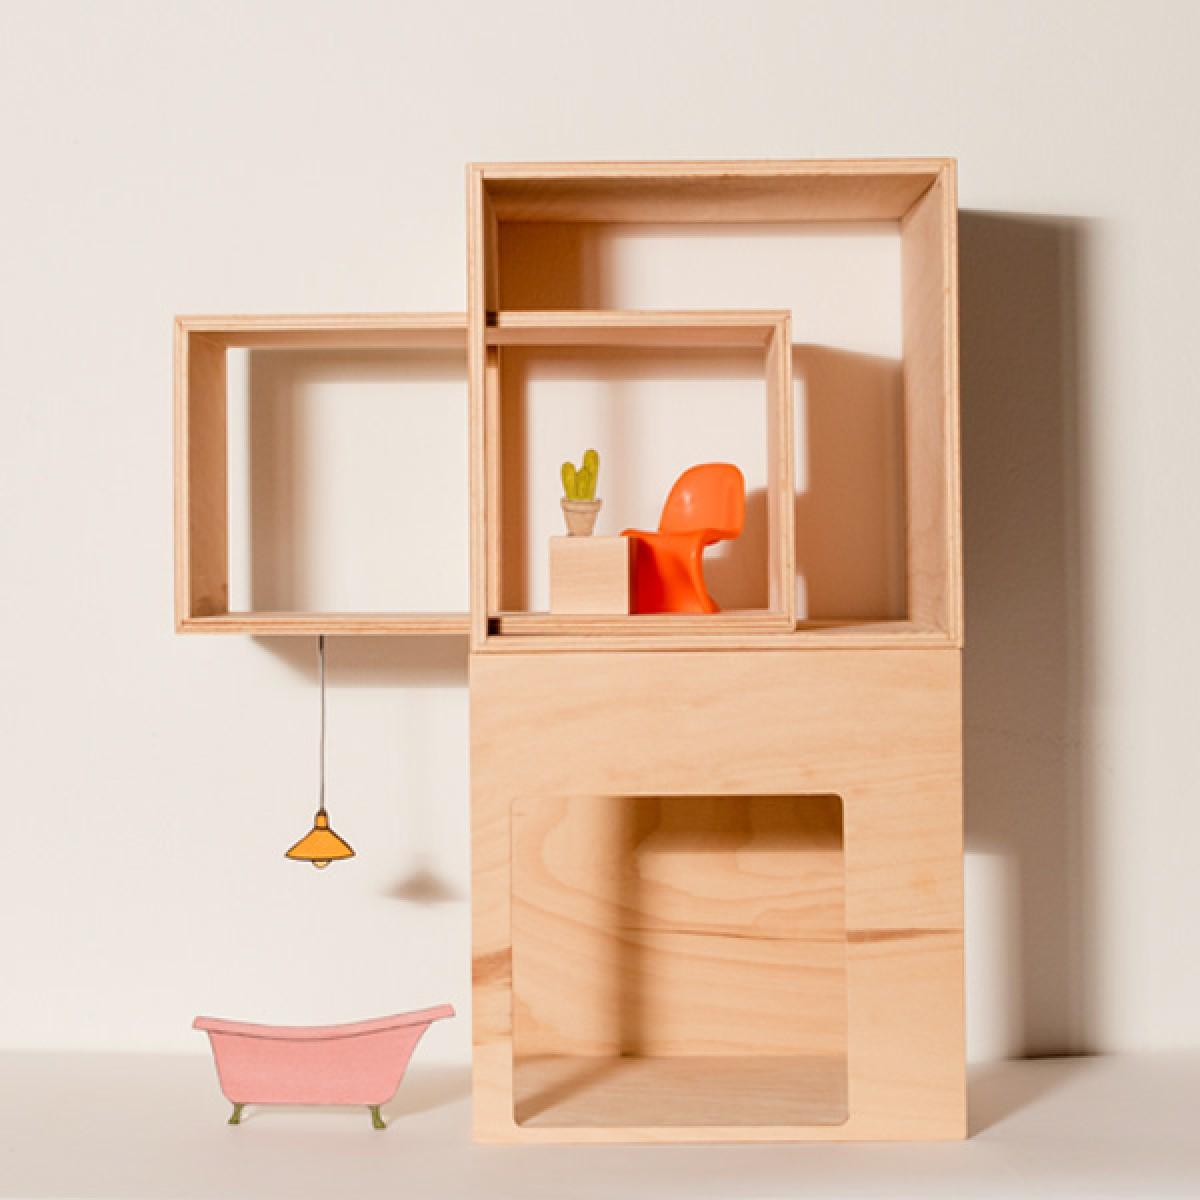 LOOMI - das modulare Puppenhaus von studio jul.s